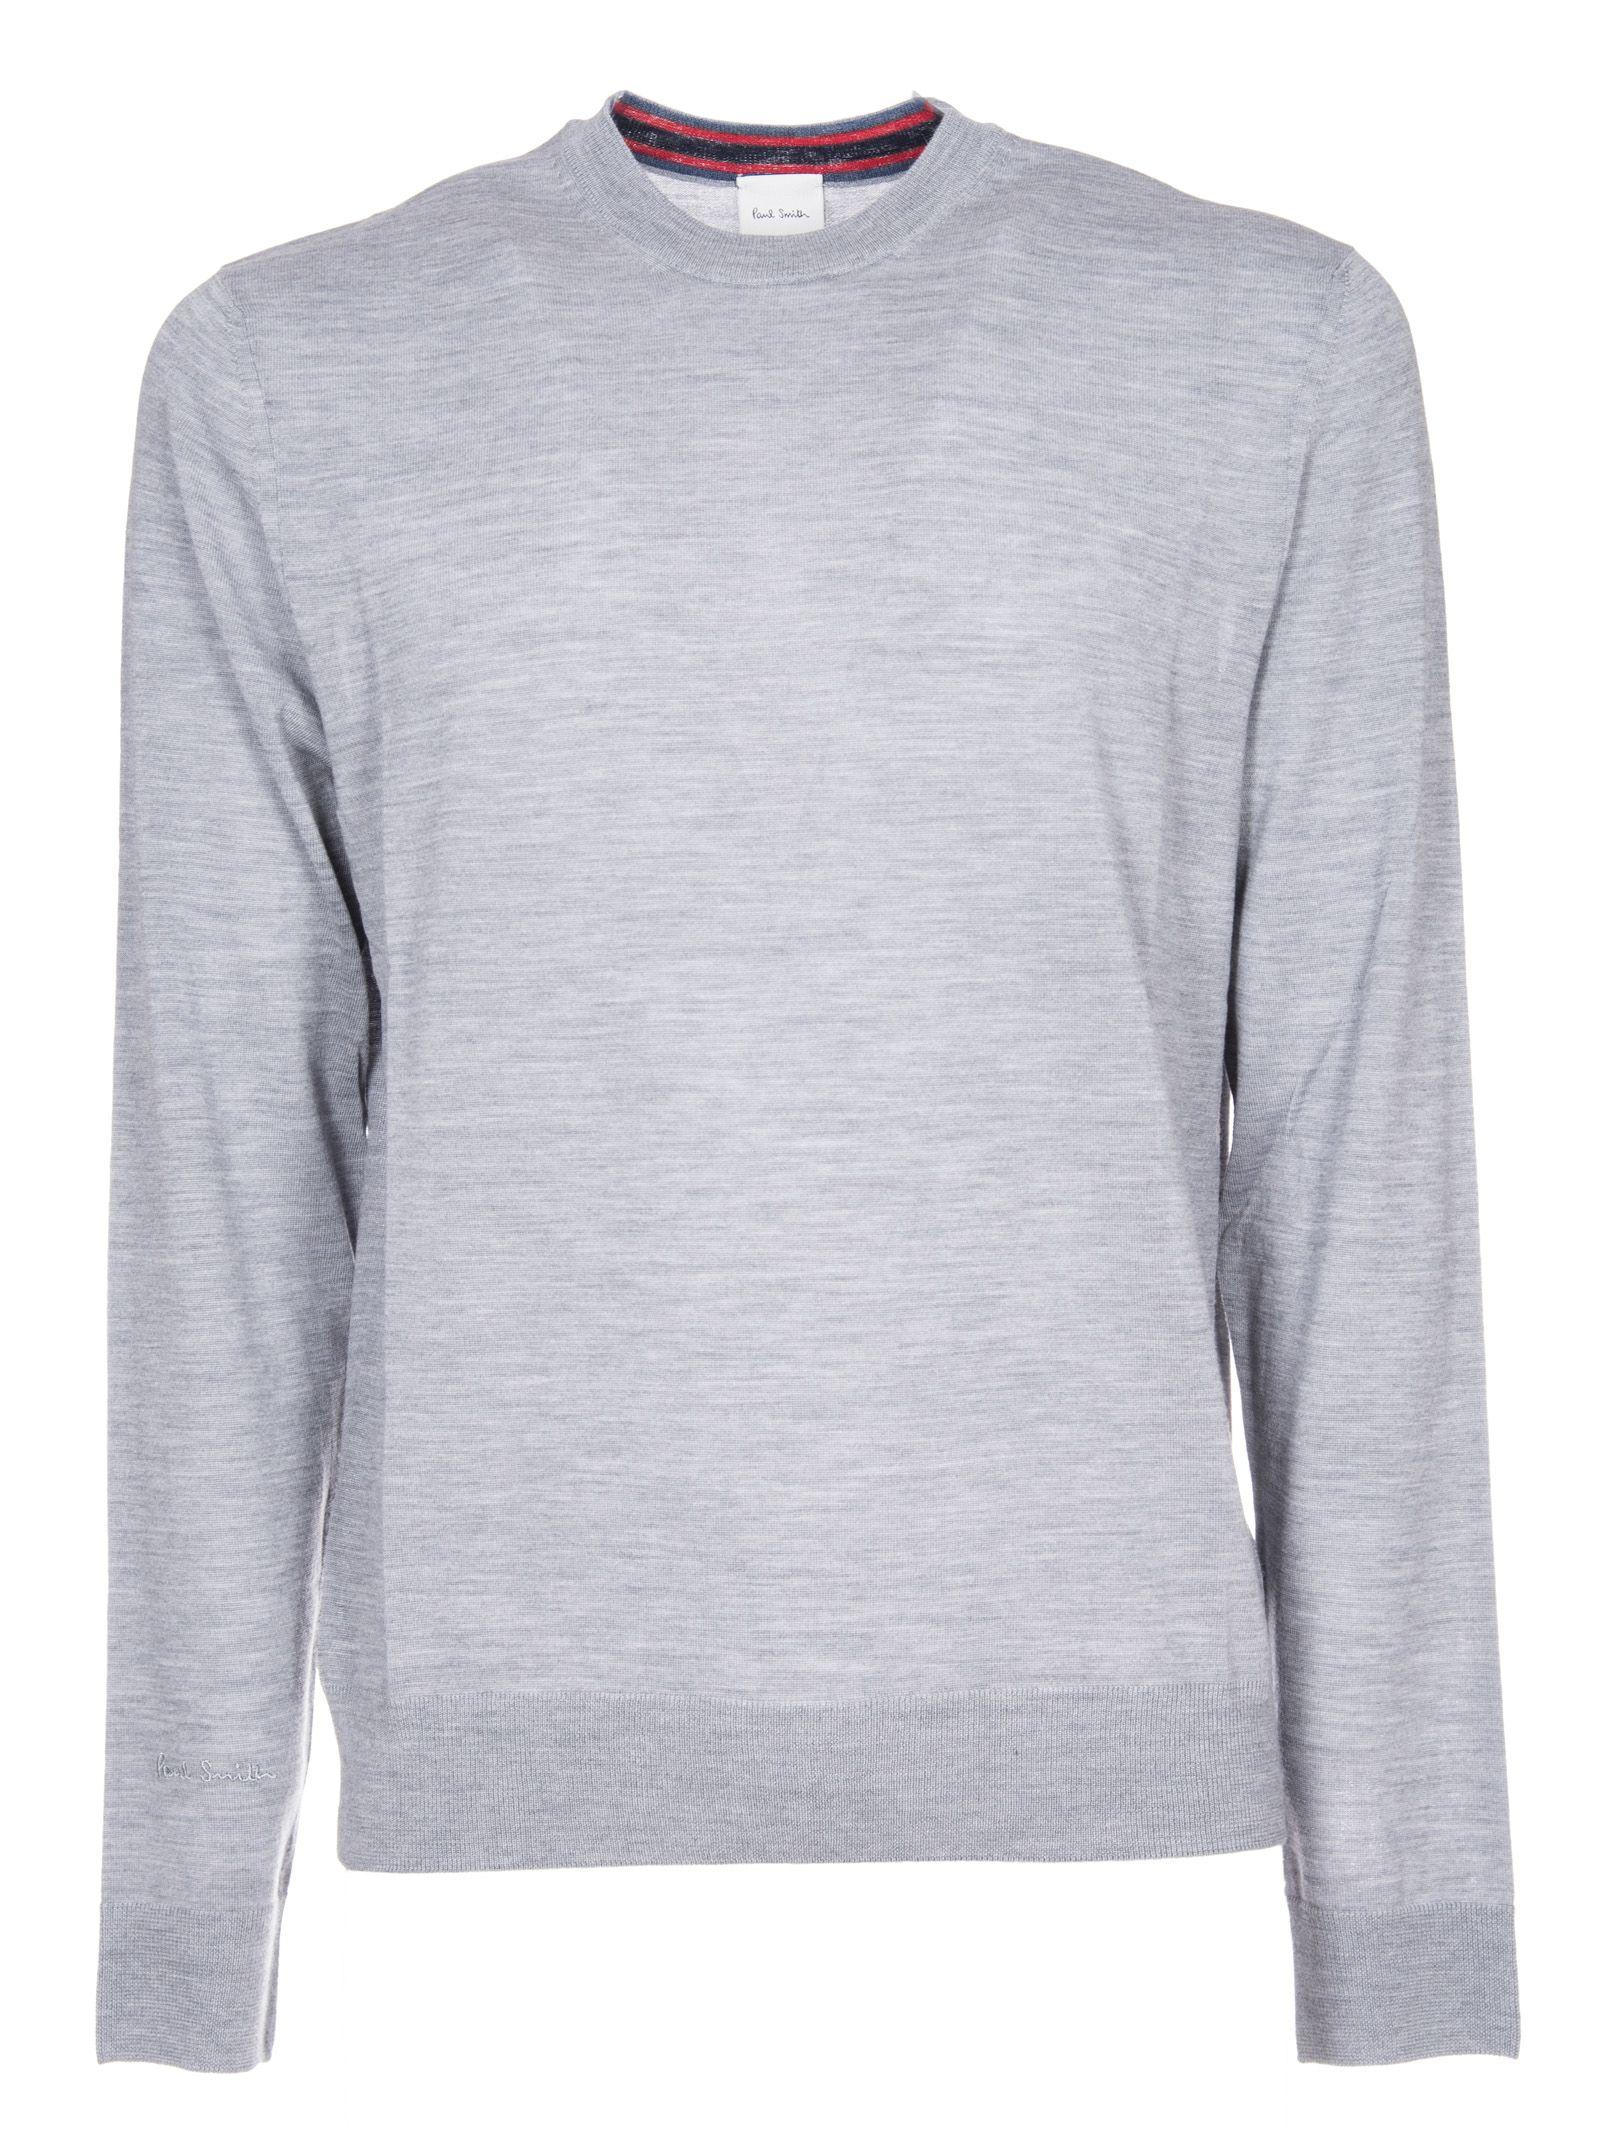 Paul Smith Classic Sweater